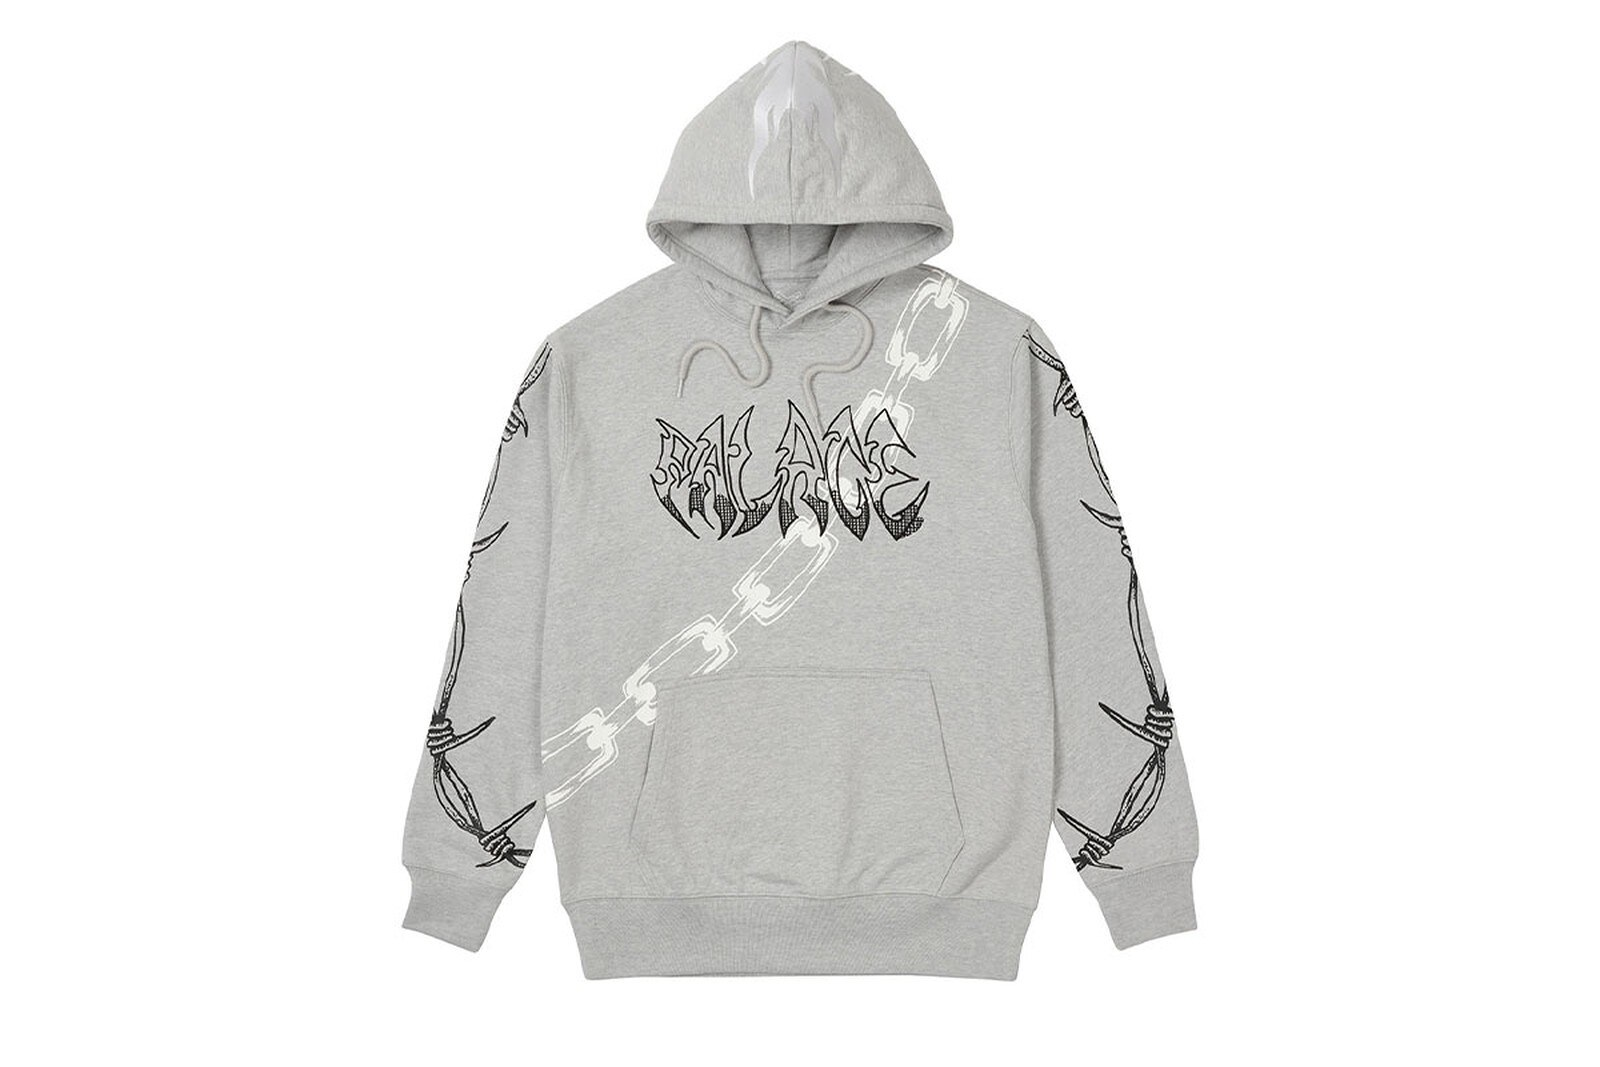 Palace x Lotties hoodie